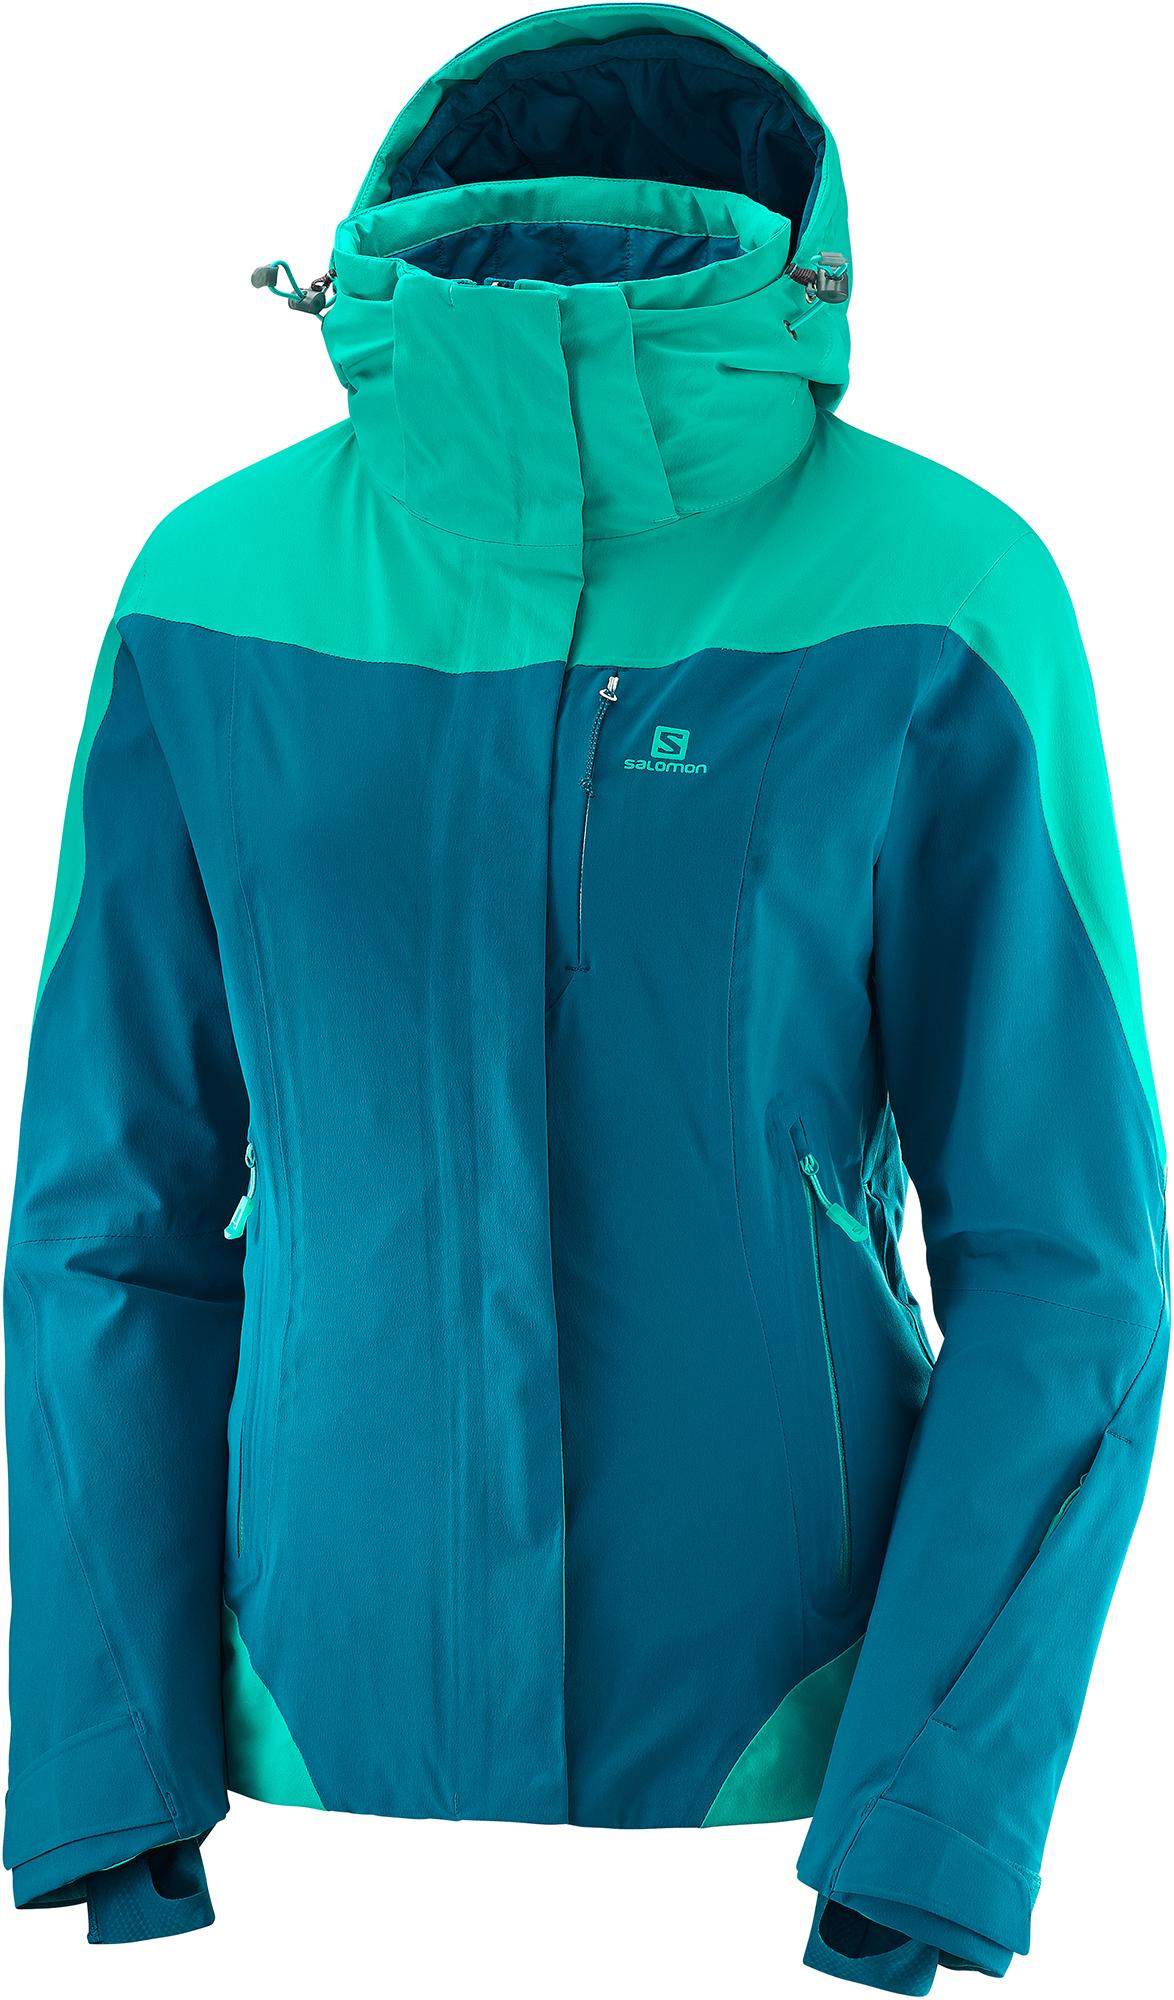 Salomon Куртка утепленная женская Salomon Icerocket, размер 54 цены онлайн